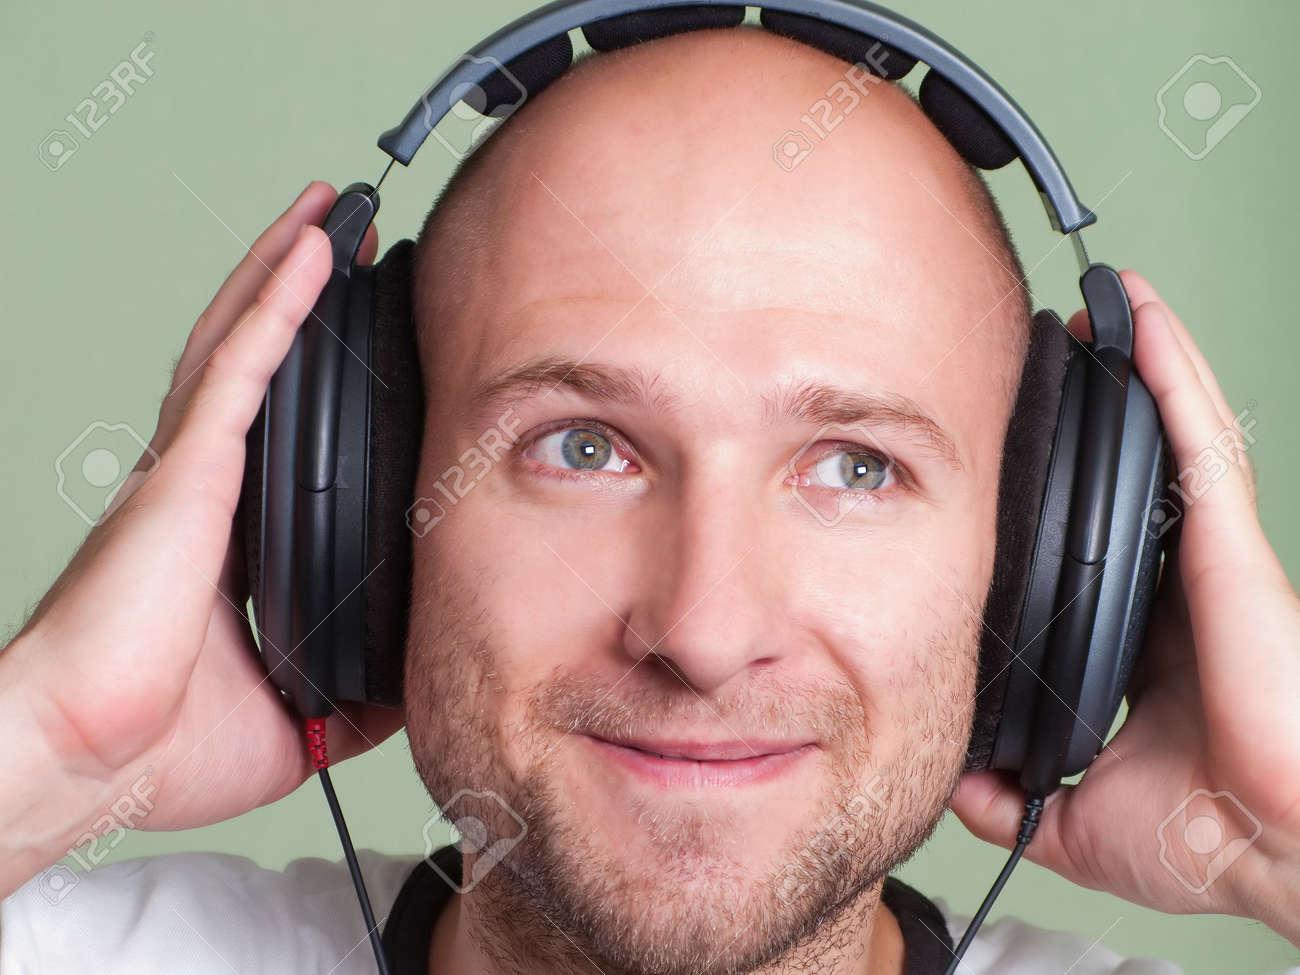 Adult men in sound headphones listening mp3 music Stock Photo - 5313798